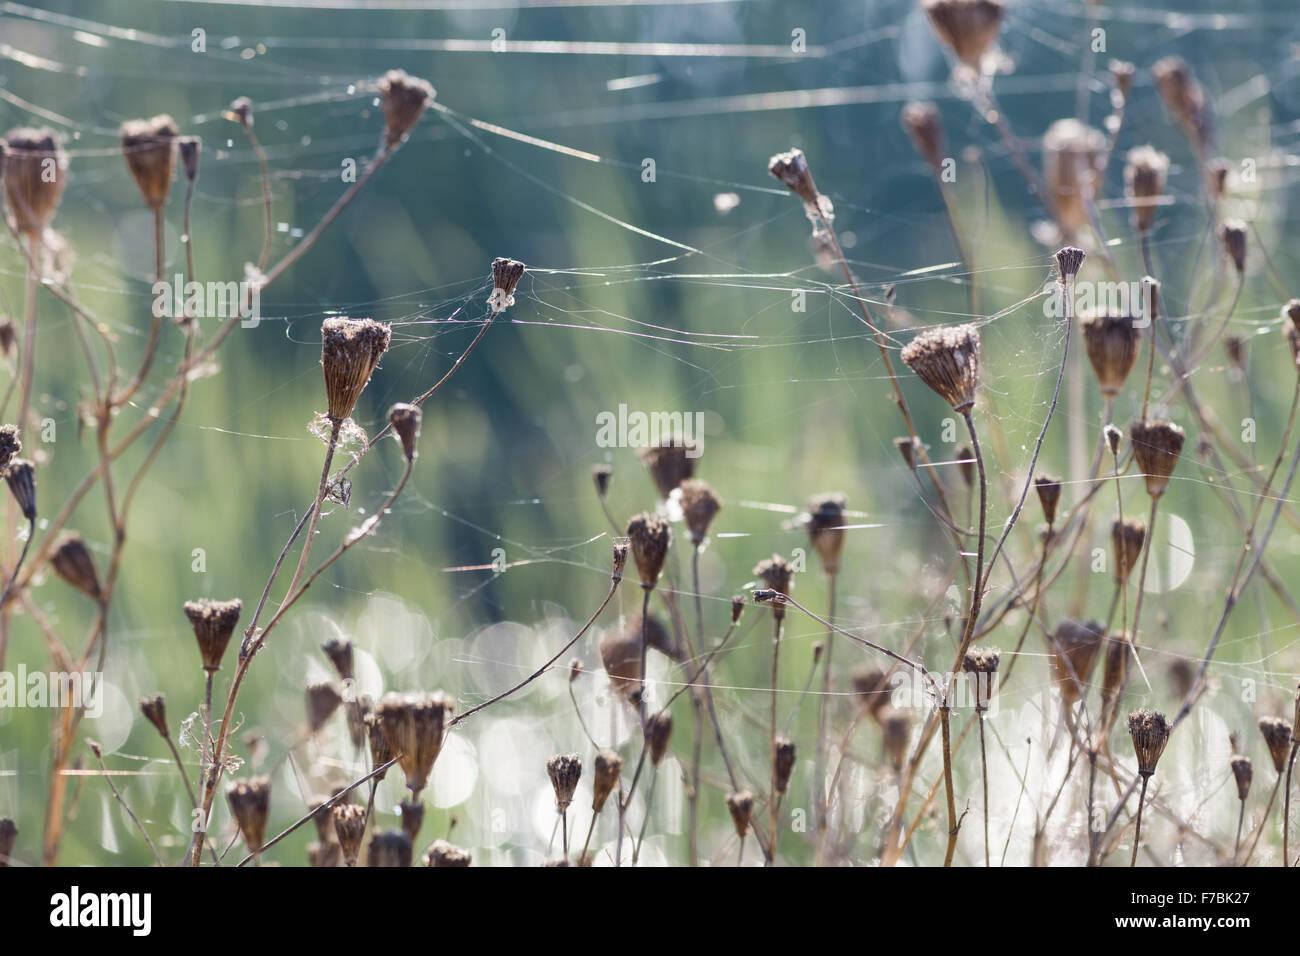 Fine spider webs. Yolo Bypass Wildlife Area, Sacramento, CA. - Stock Image